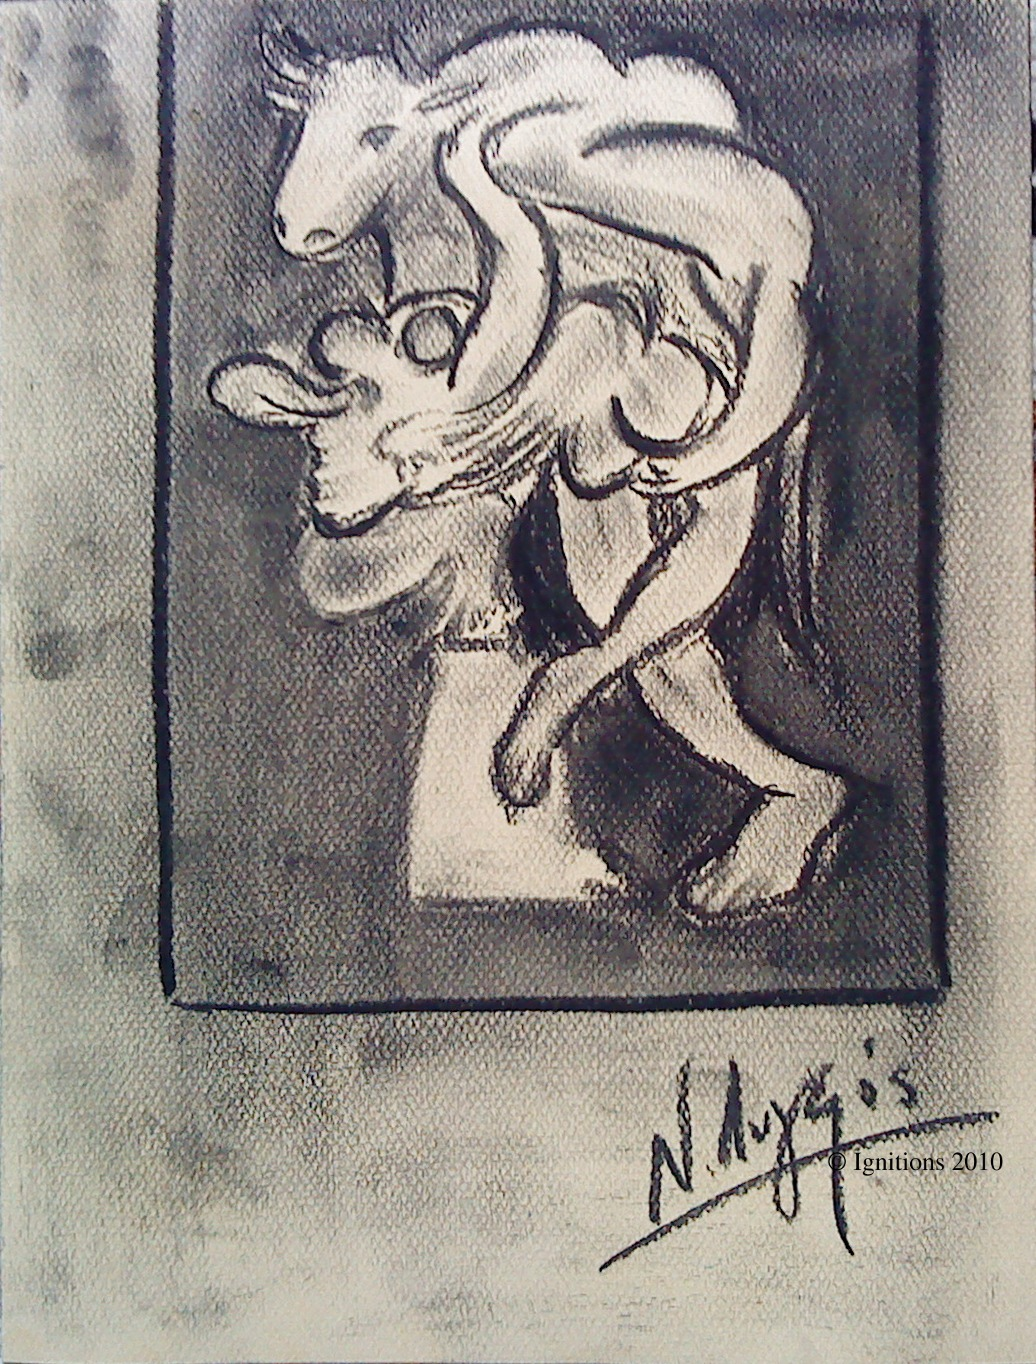 Minotaure et femme nue de Picasso I.